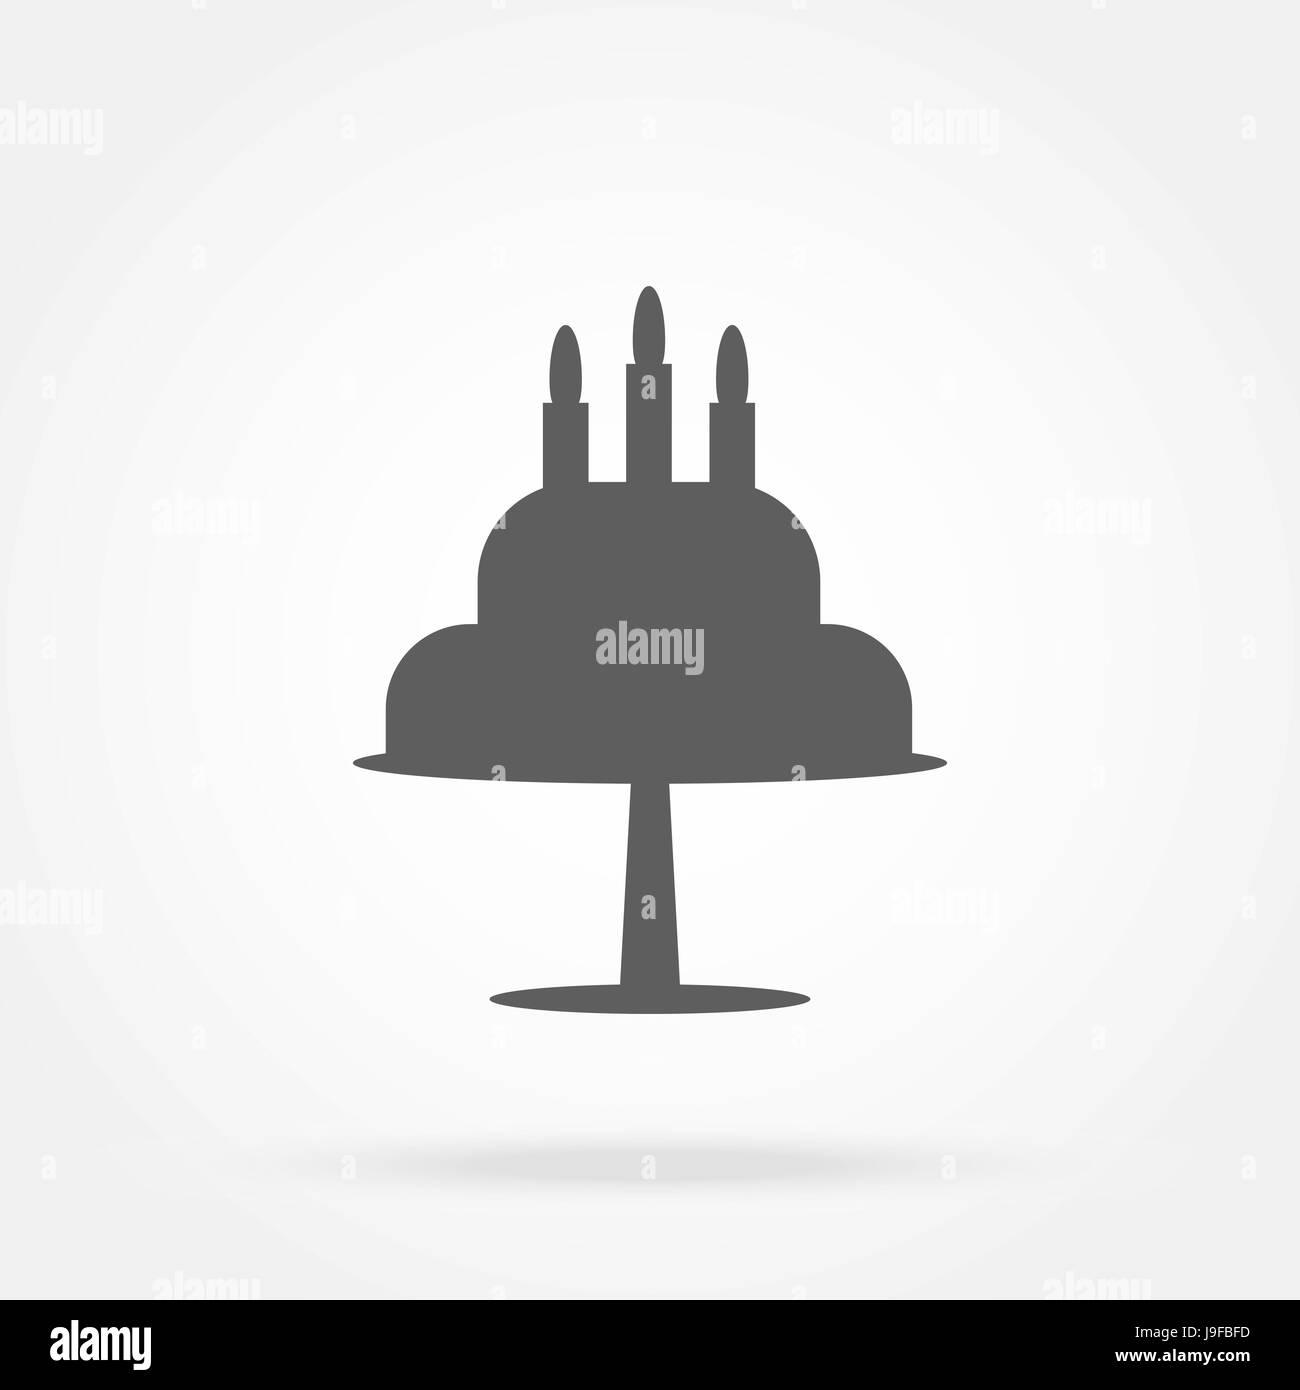 Kuchen Icon Vektor Vektor Abbildung Bild 143553185 Alamy